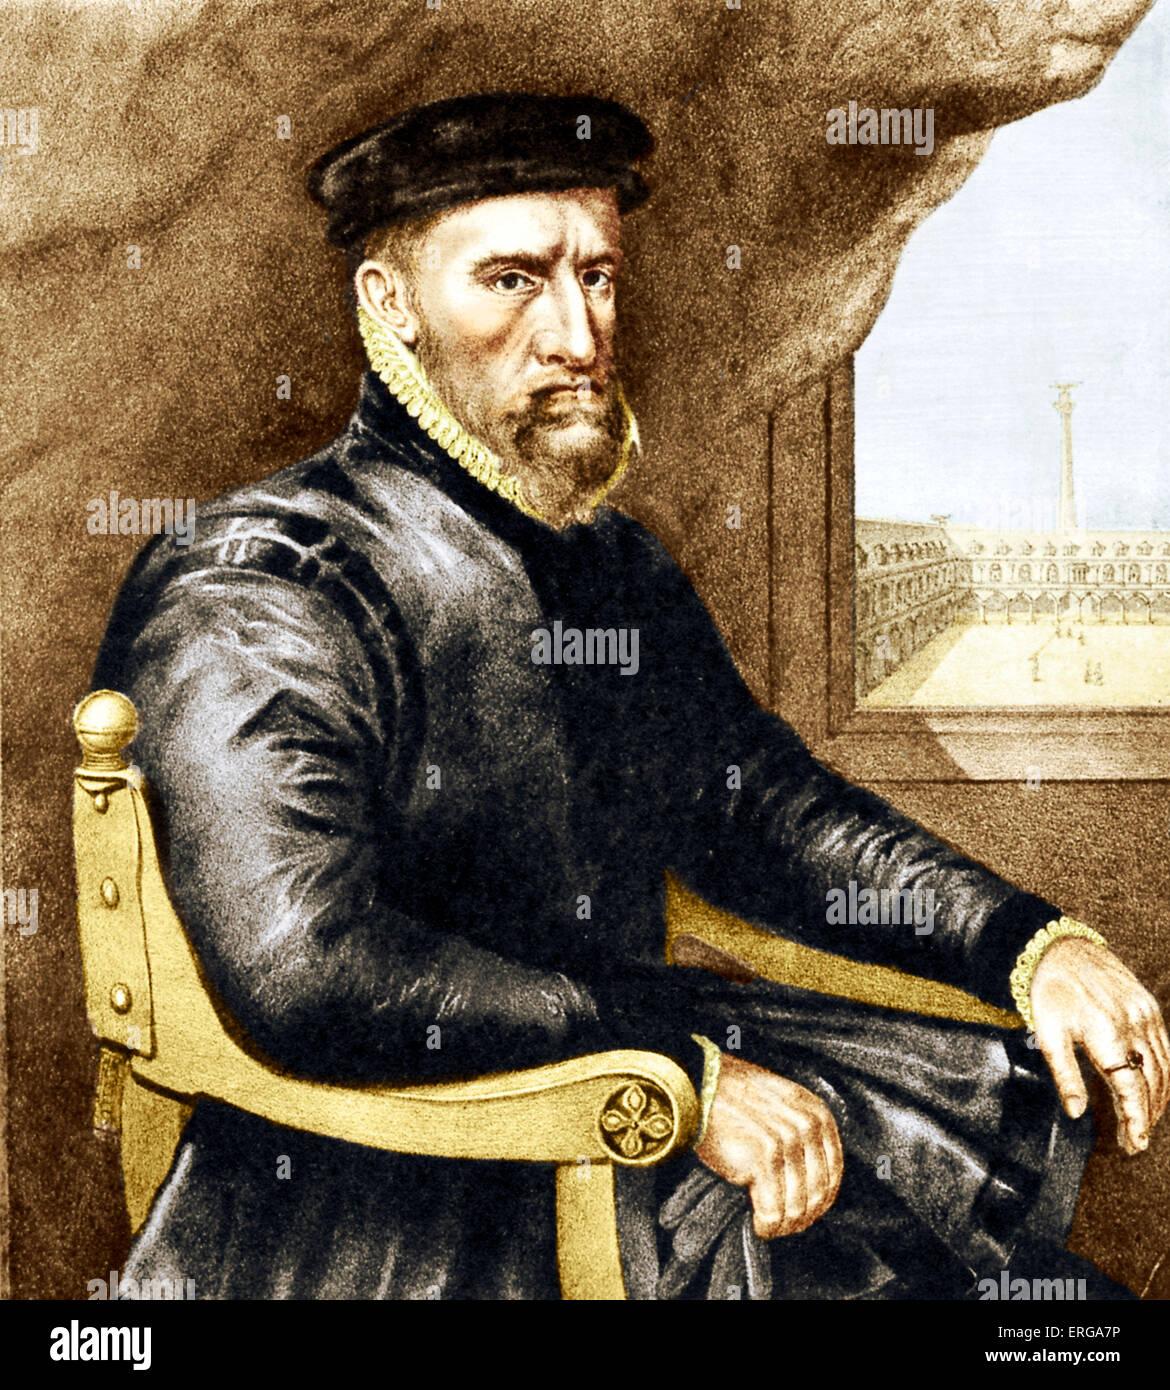 Sir Thomas Gresham (1519 – 21 November 1579), English merchant and financier who worked for King Edward VI of England Stock Photo